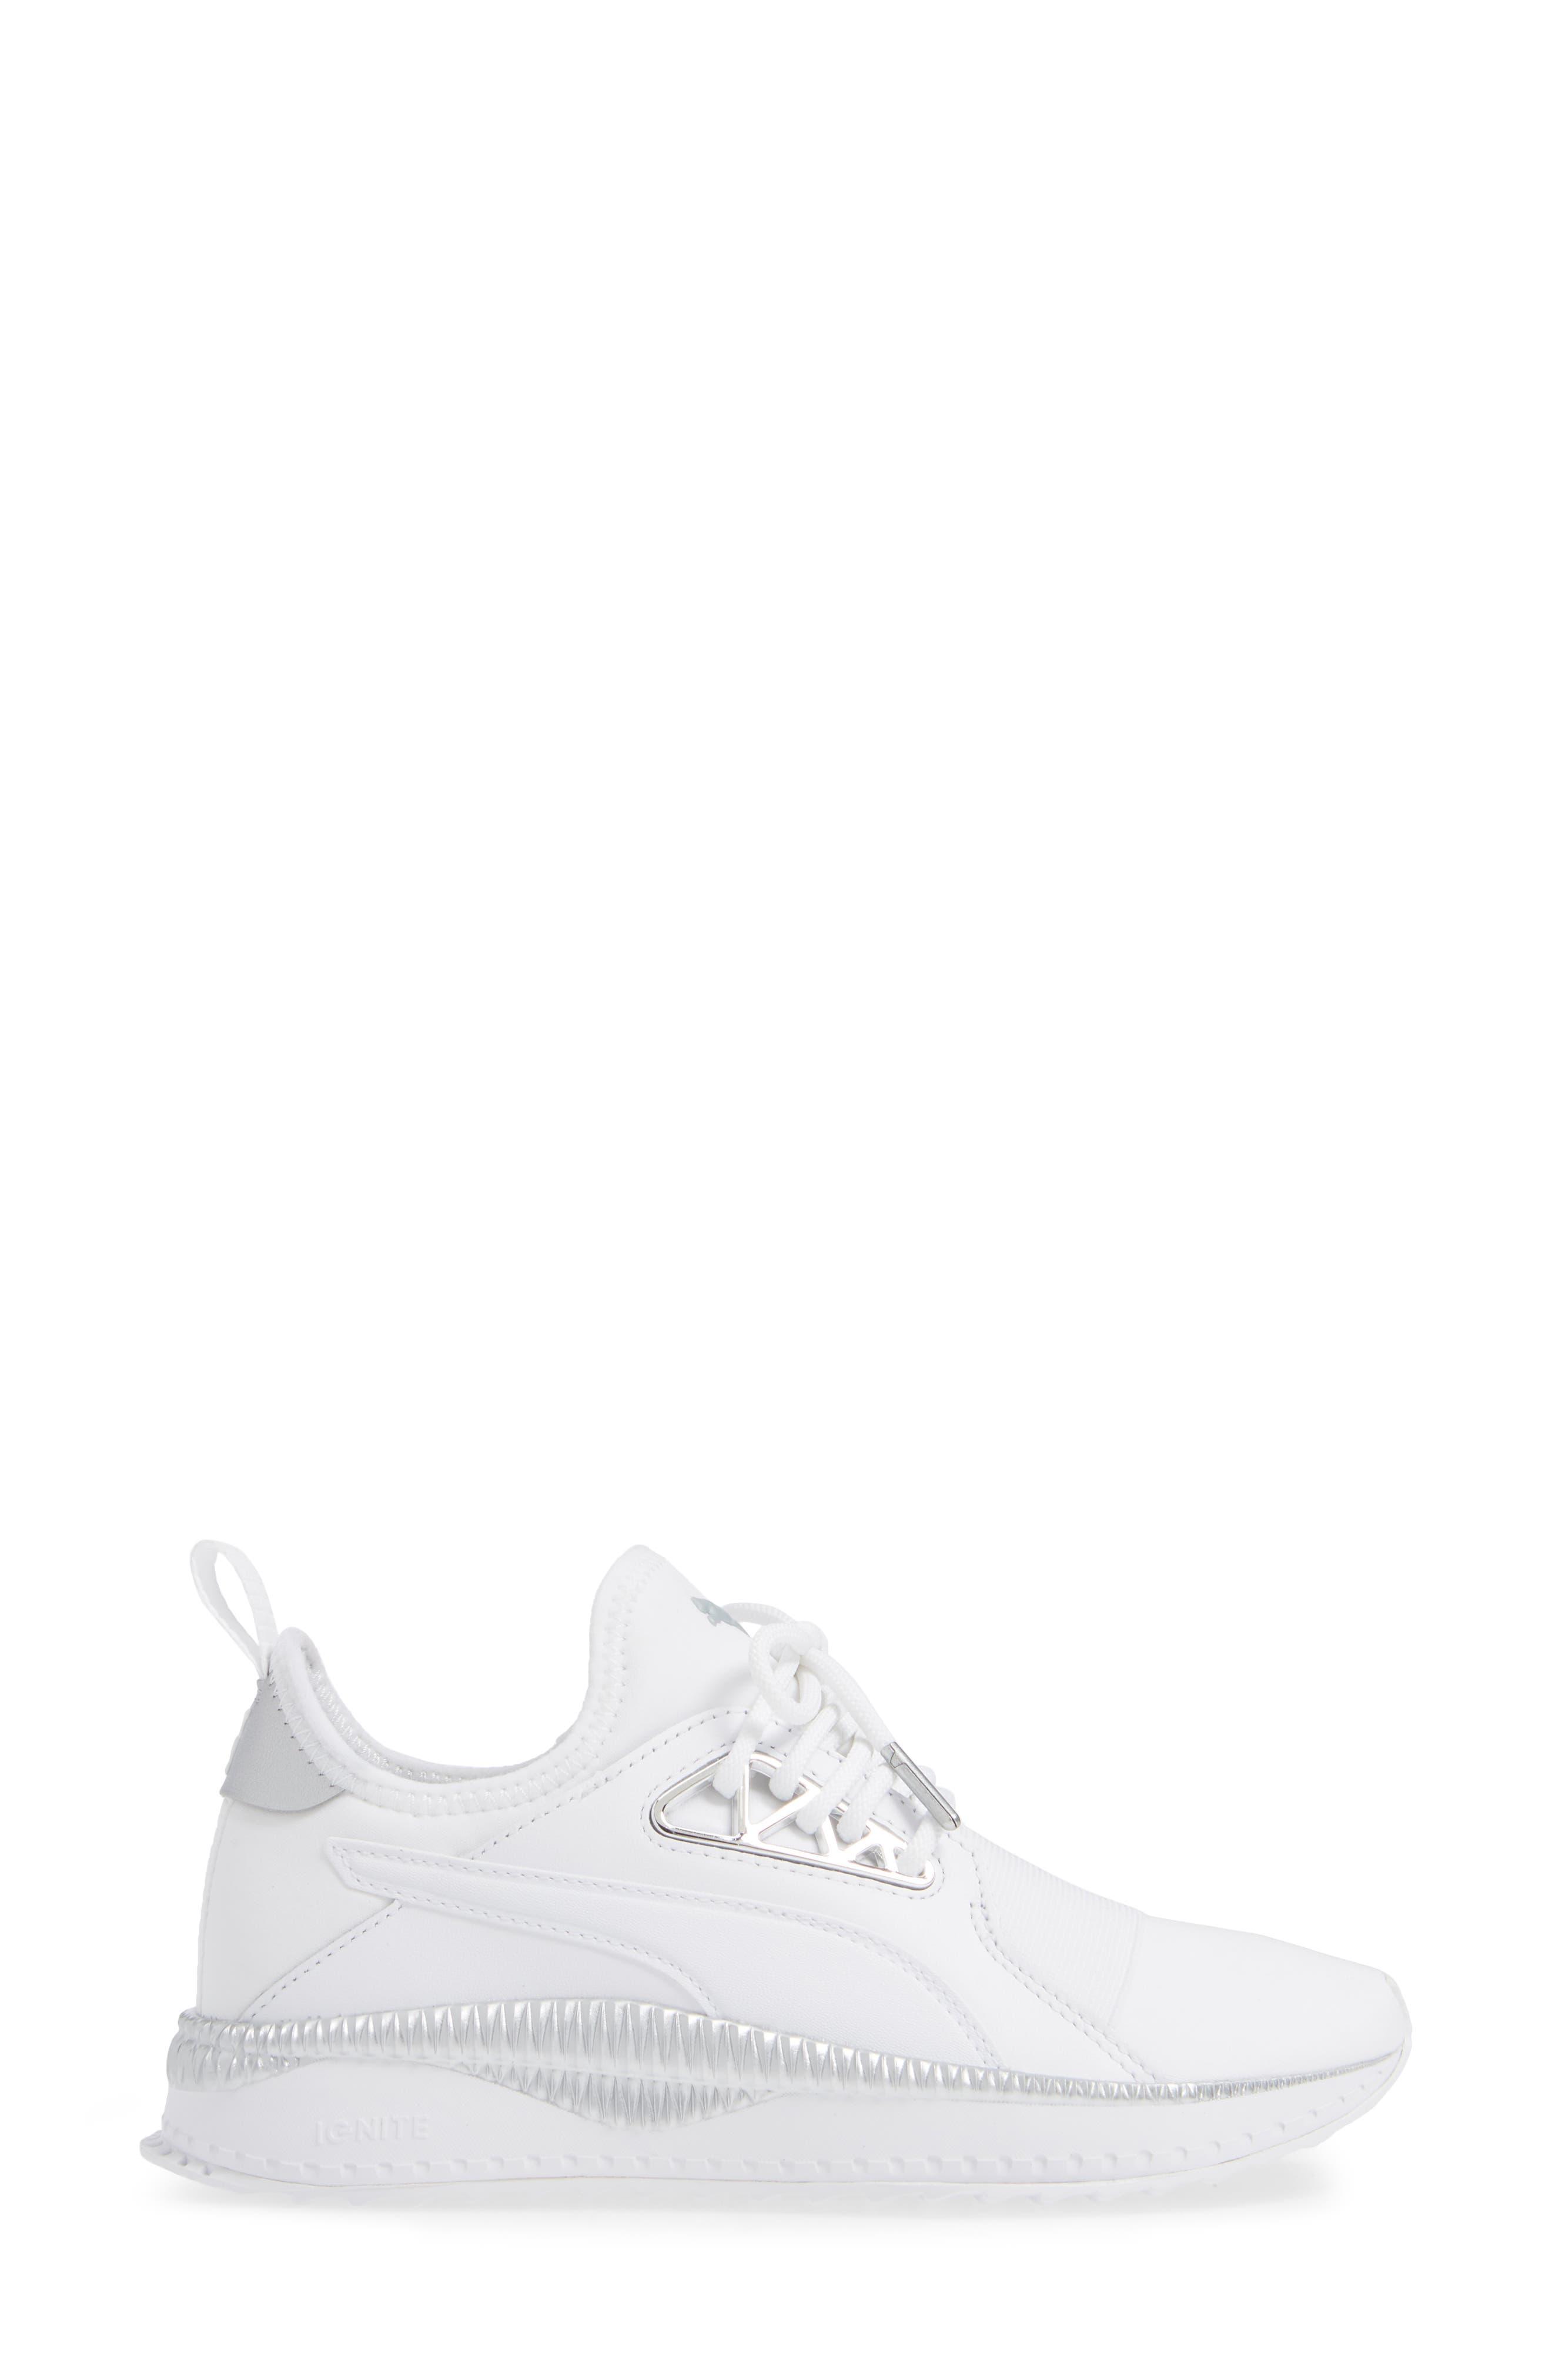 TSUGI Apex Jewel Sneaker,                             Alternate thumbnail 3, color,                             PUMA WHITE/ PUMA WHITE